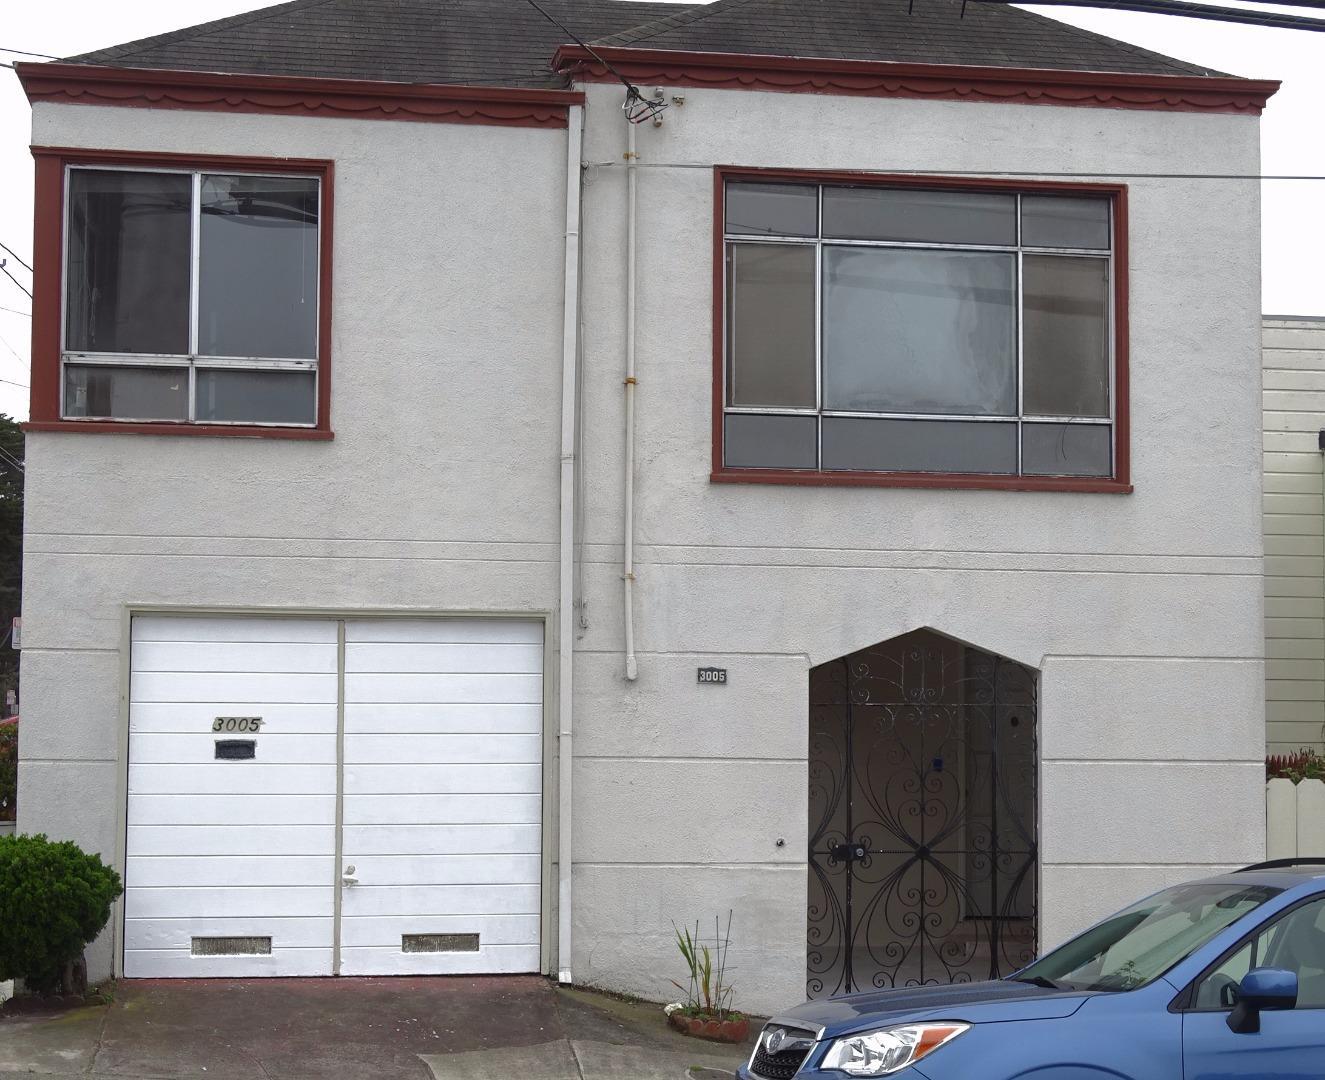 3005 Noriega Street, SAN FRANCISCO, CA 94122